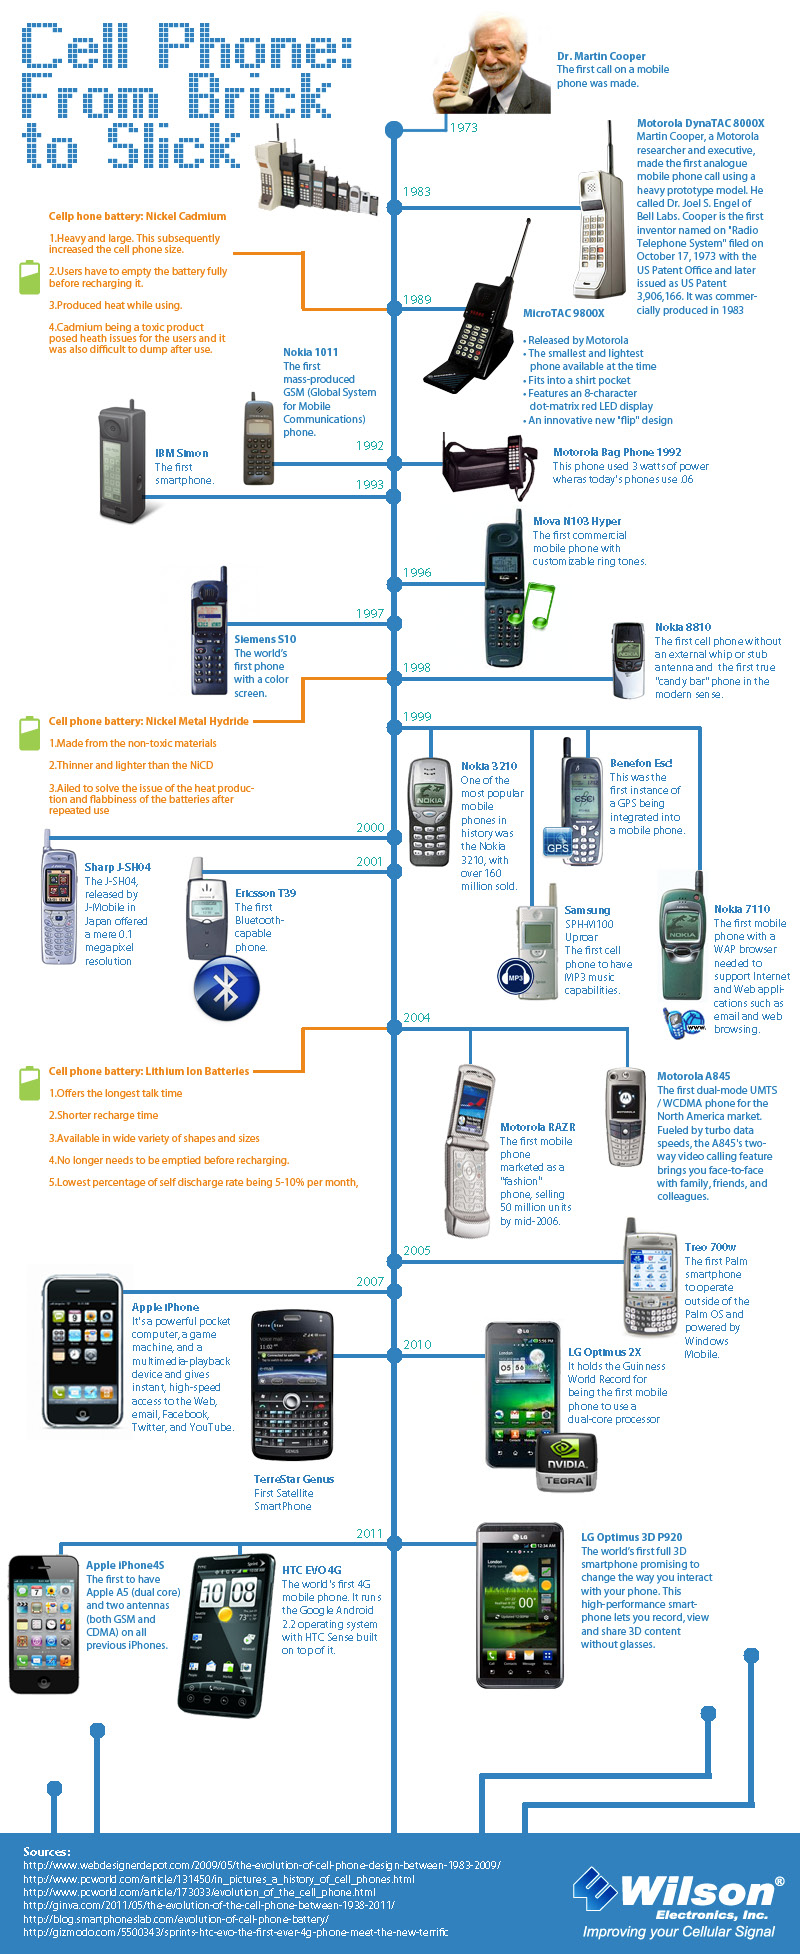 Moblie Phone Evolution